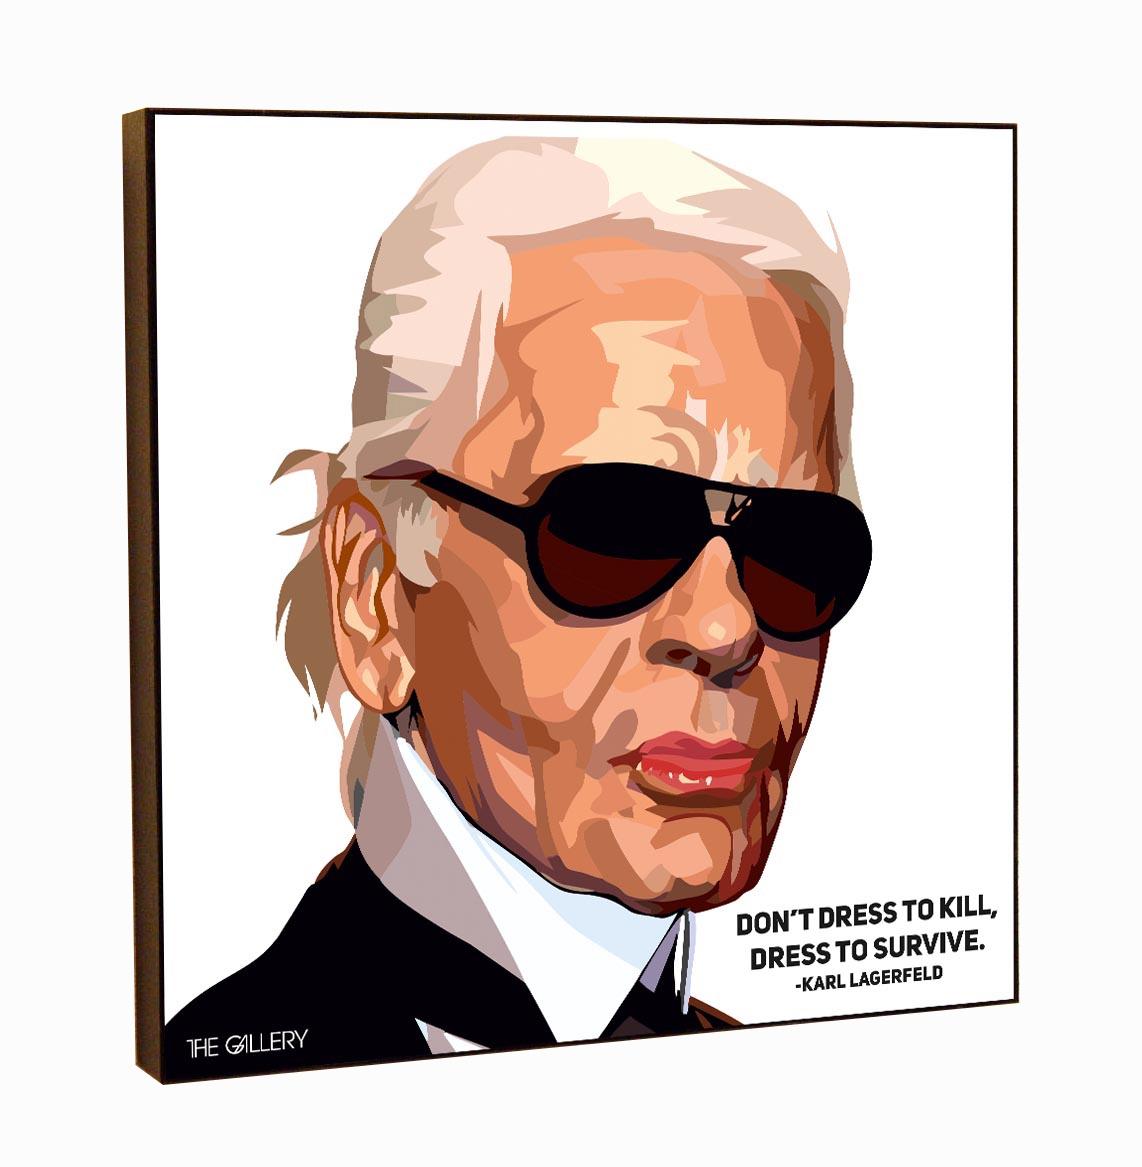 Картина постер Карл Лагерфельд в стиле поп-арт 25 х 25 см обувь карл лагерфельд купить